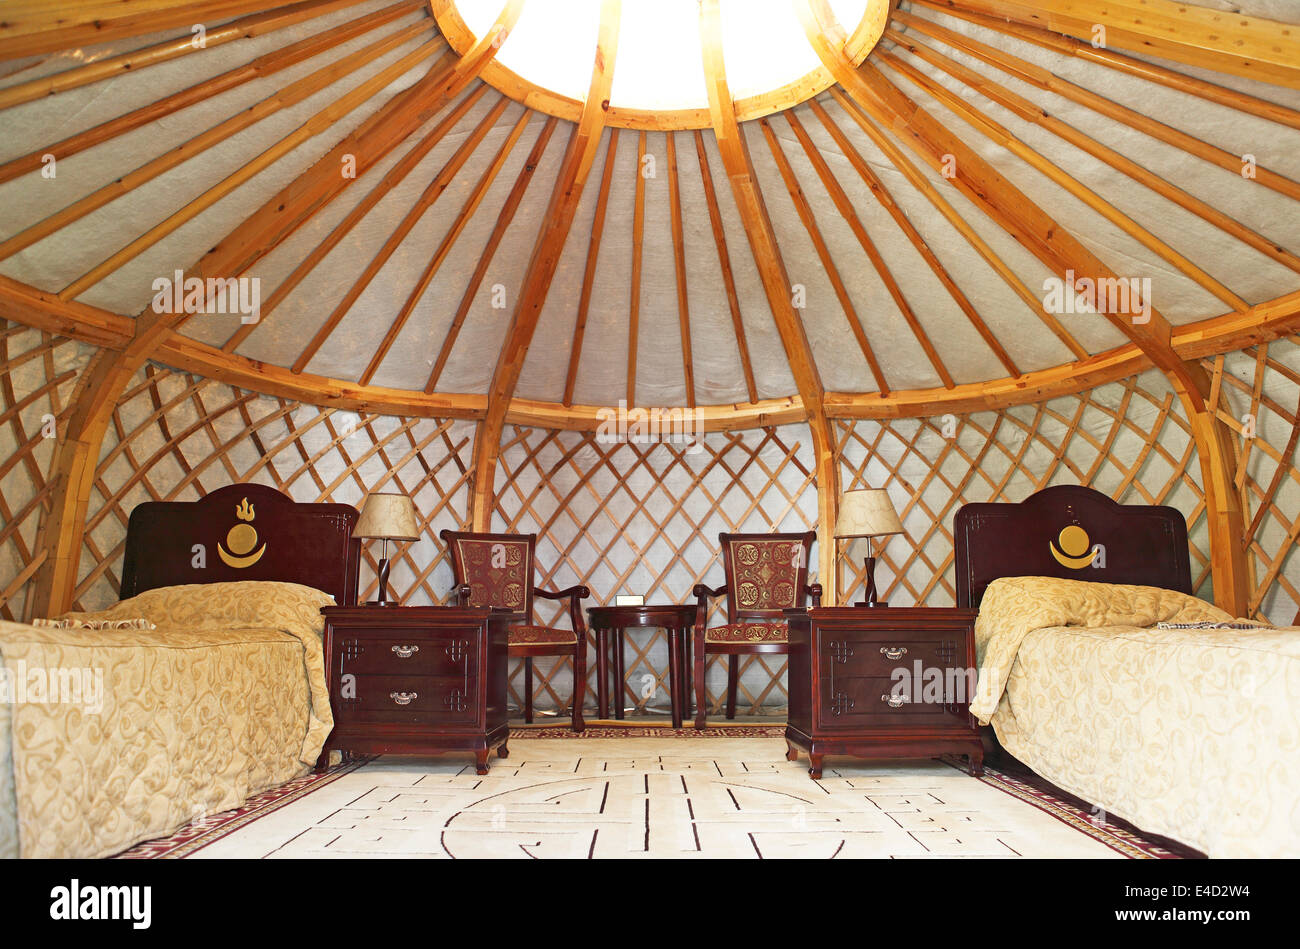 luxurious-yurt-for-tourists-interior-kha